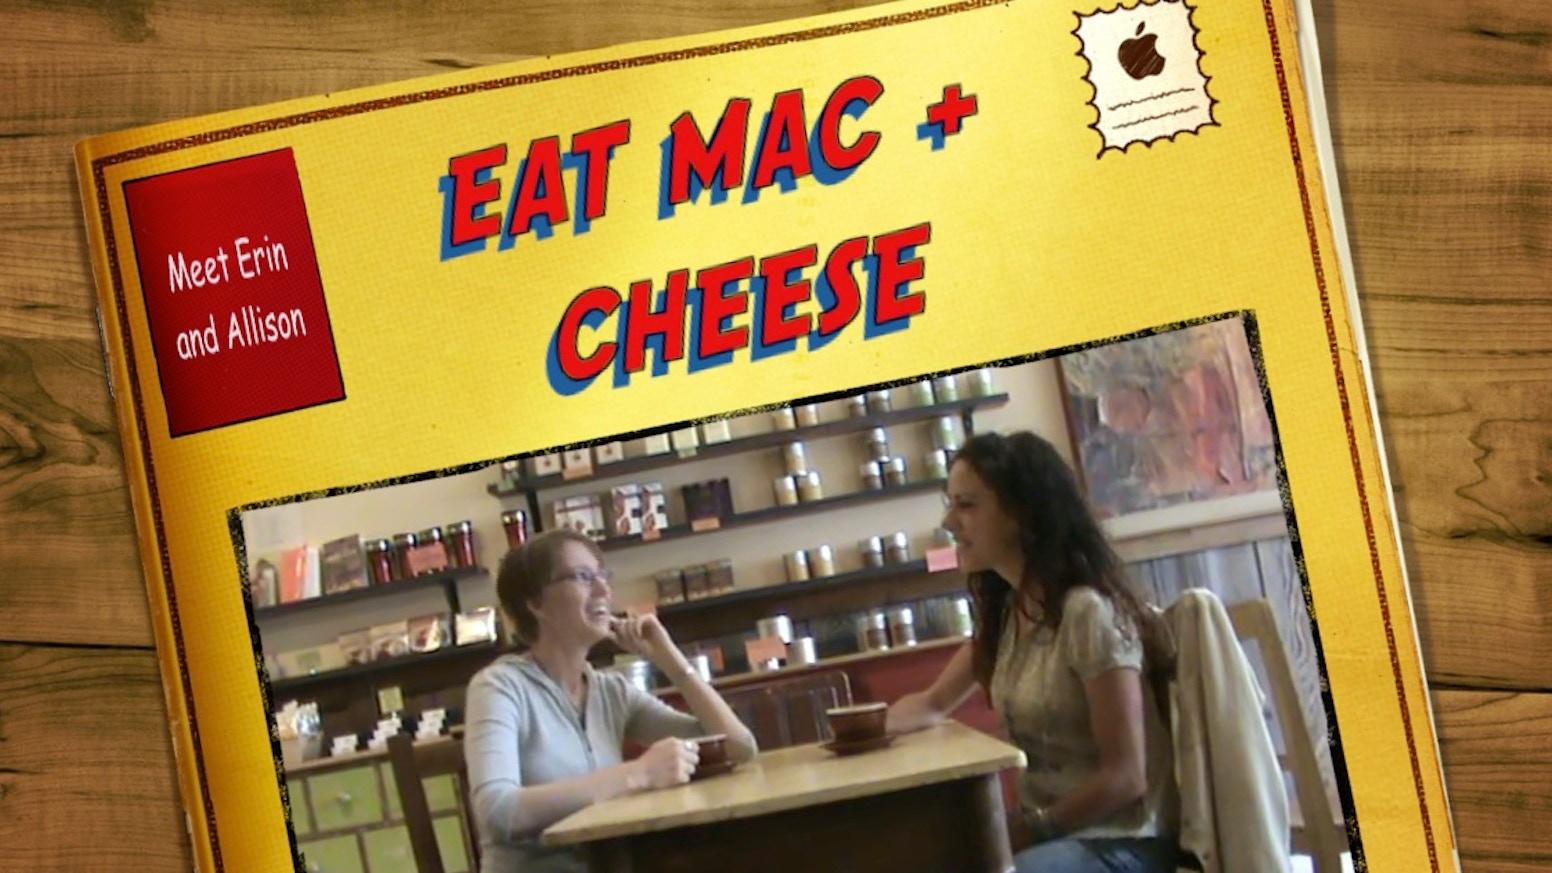 Eat mac cheese by homeroom kickstarter for Food s bar unloc